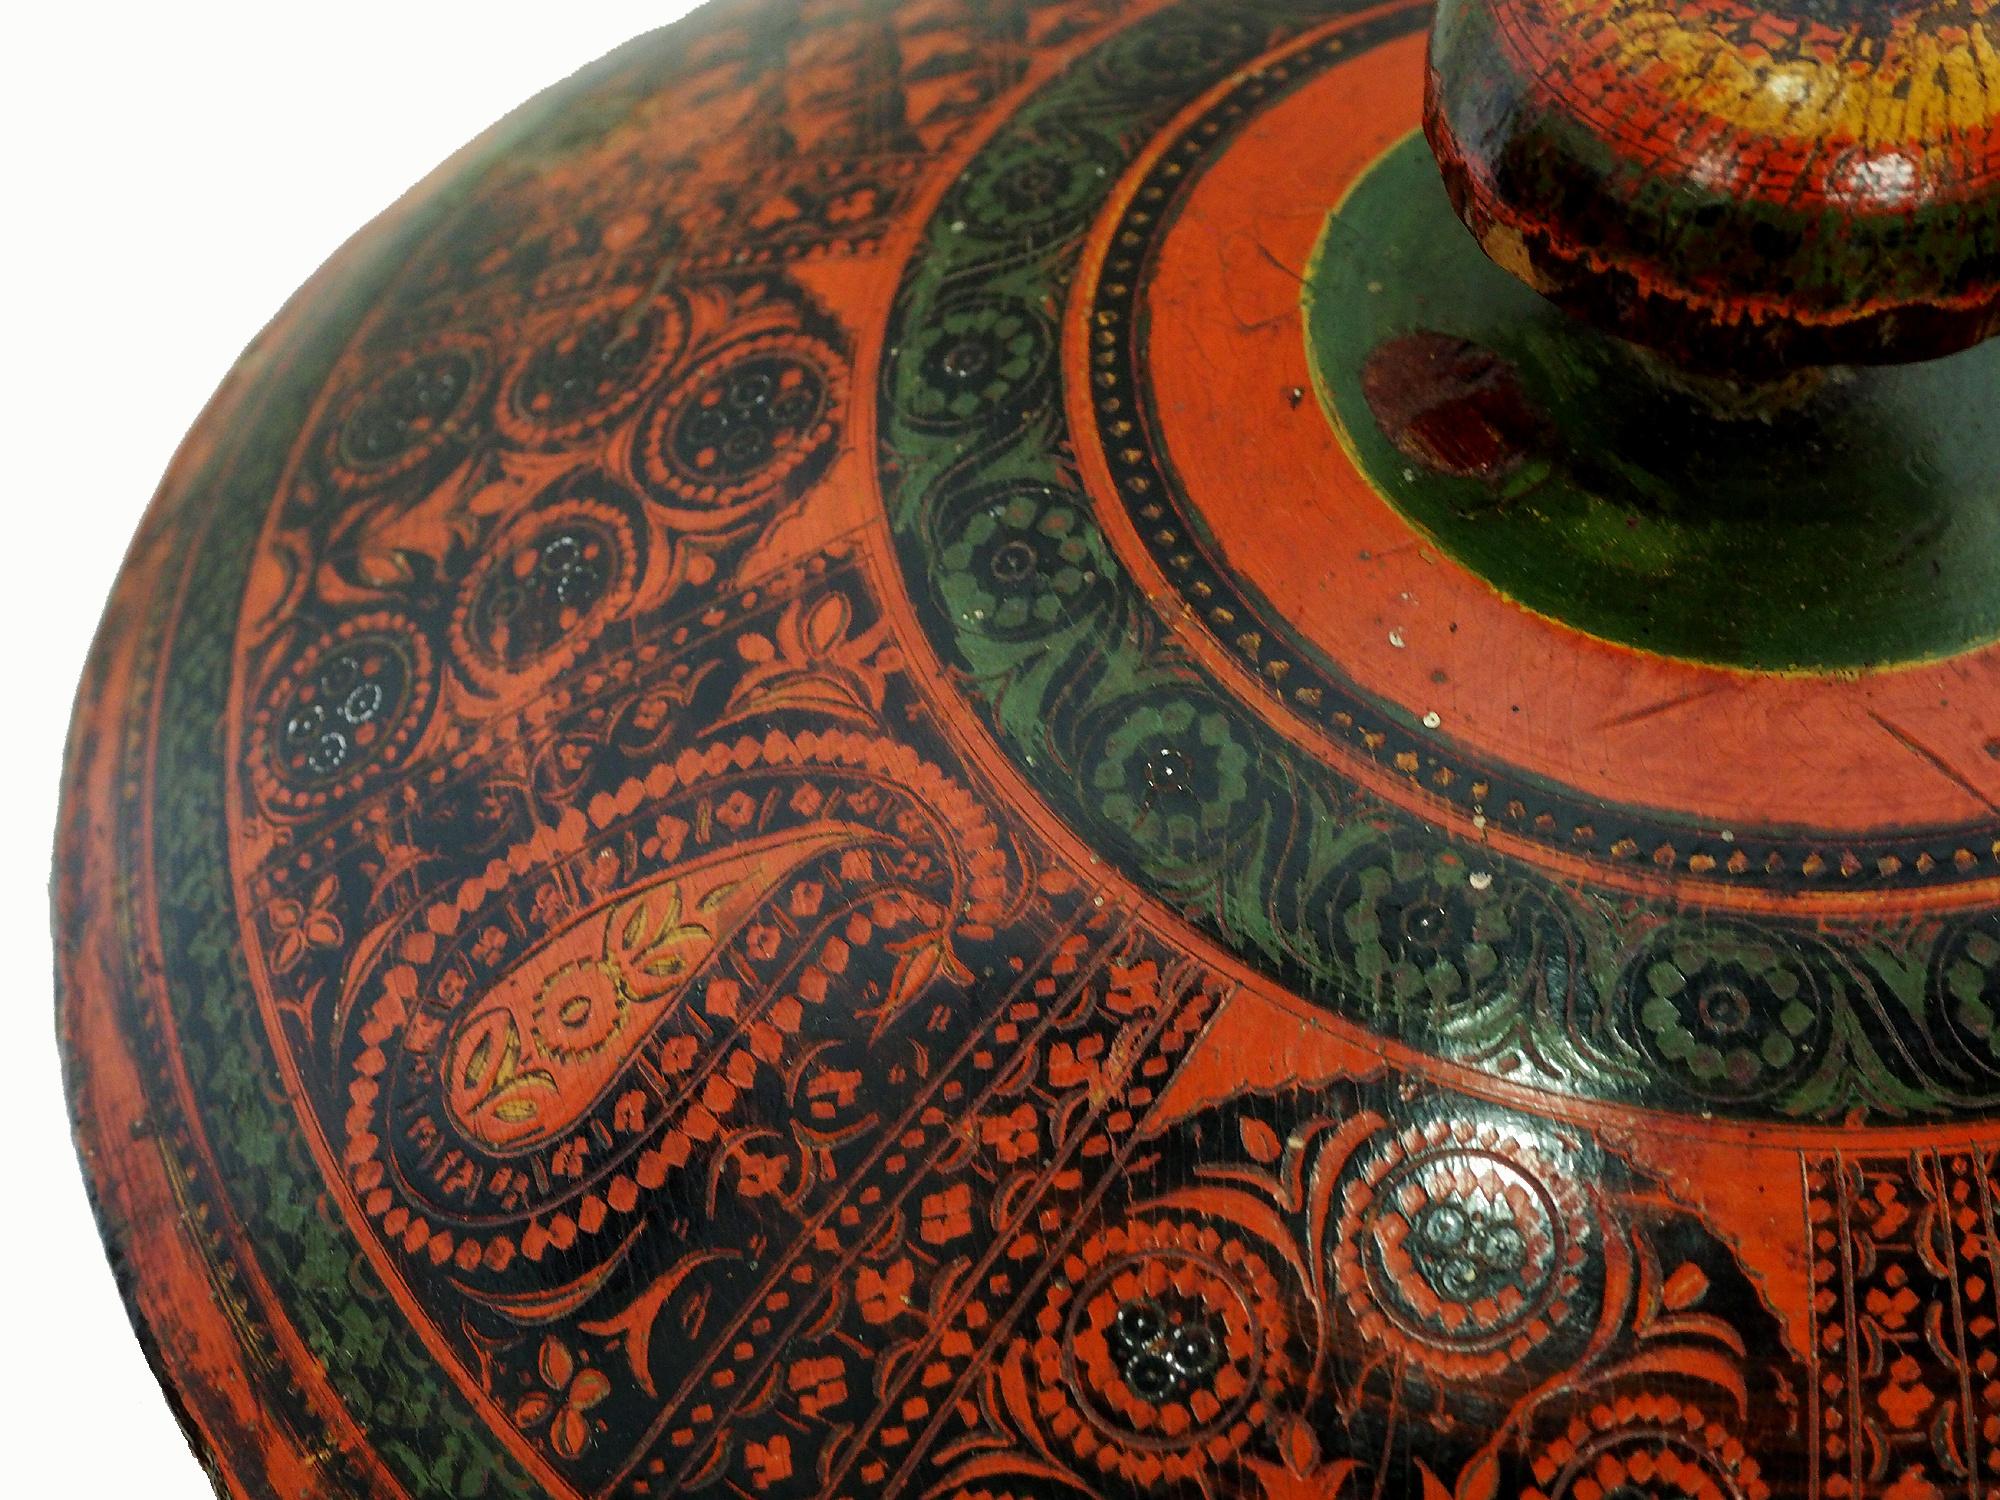 Antik orient Lacquerware Holz Gewürzdose Dose Teedose Gefäß Afghanistan Pakistan Nr:19/5